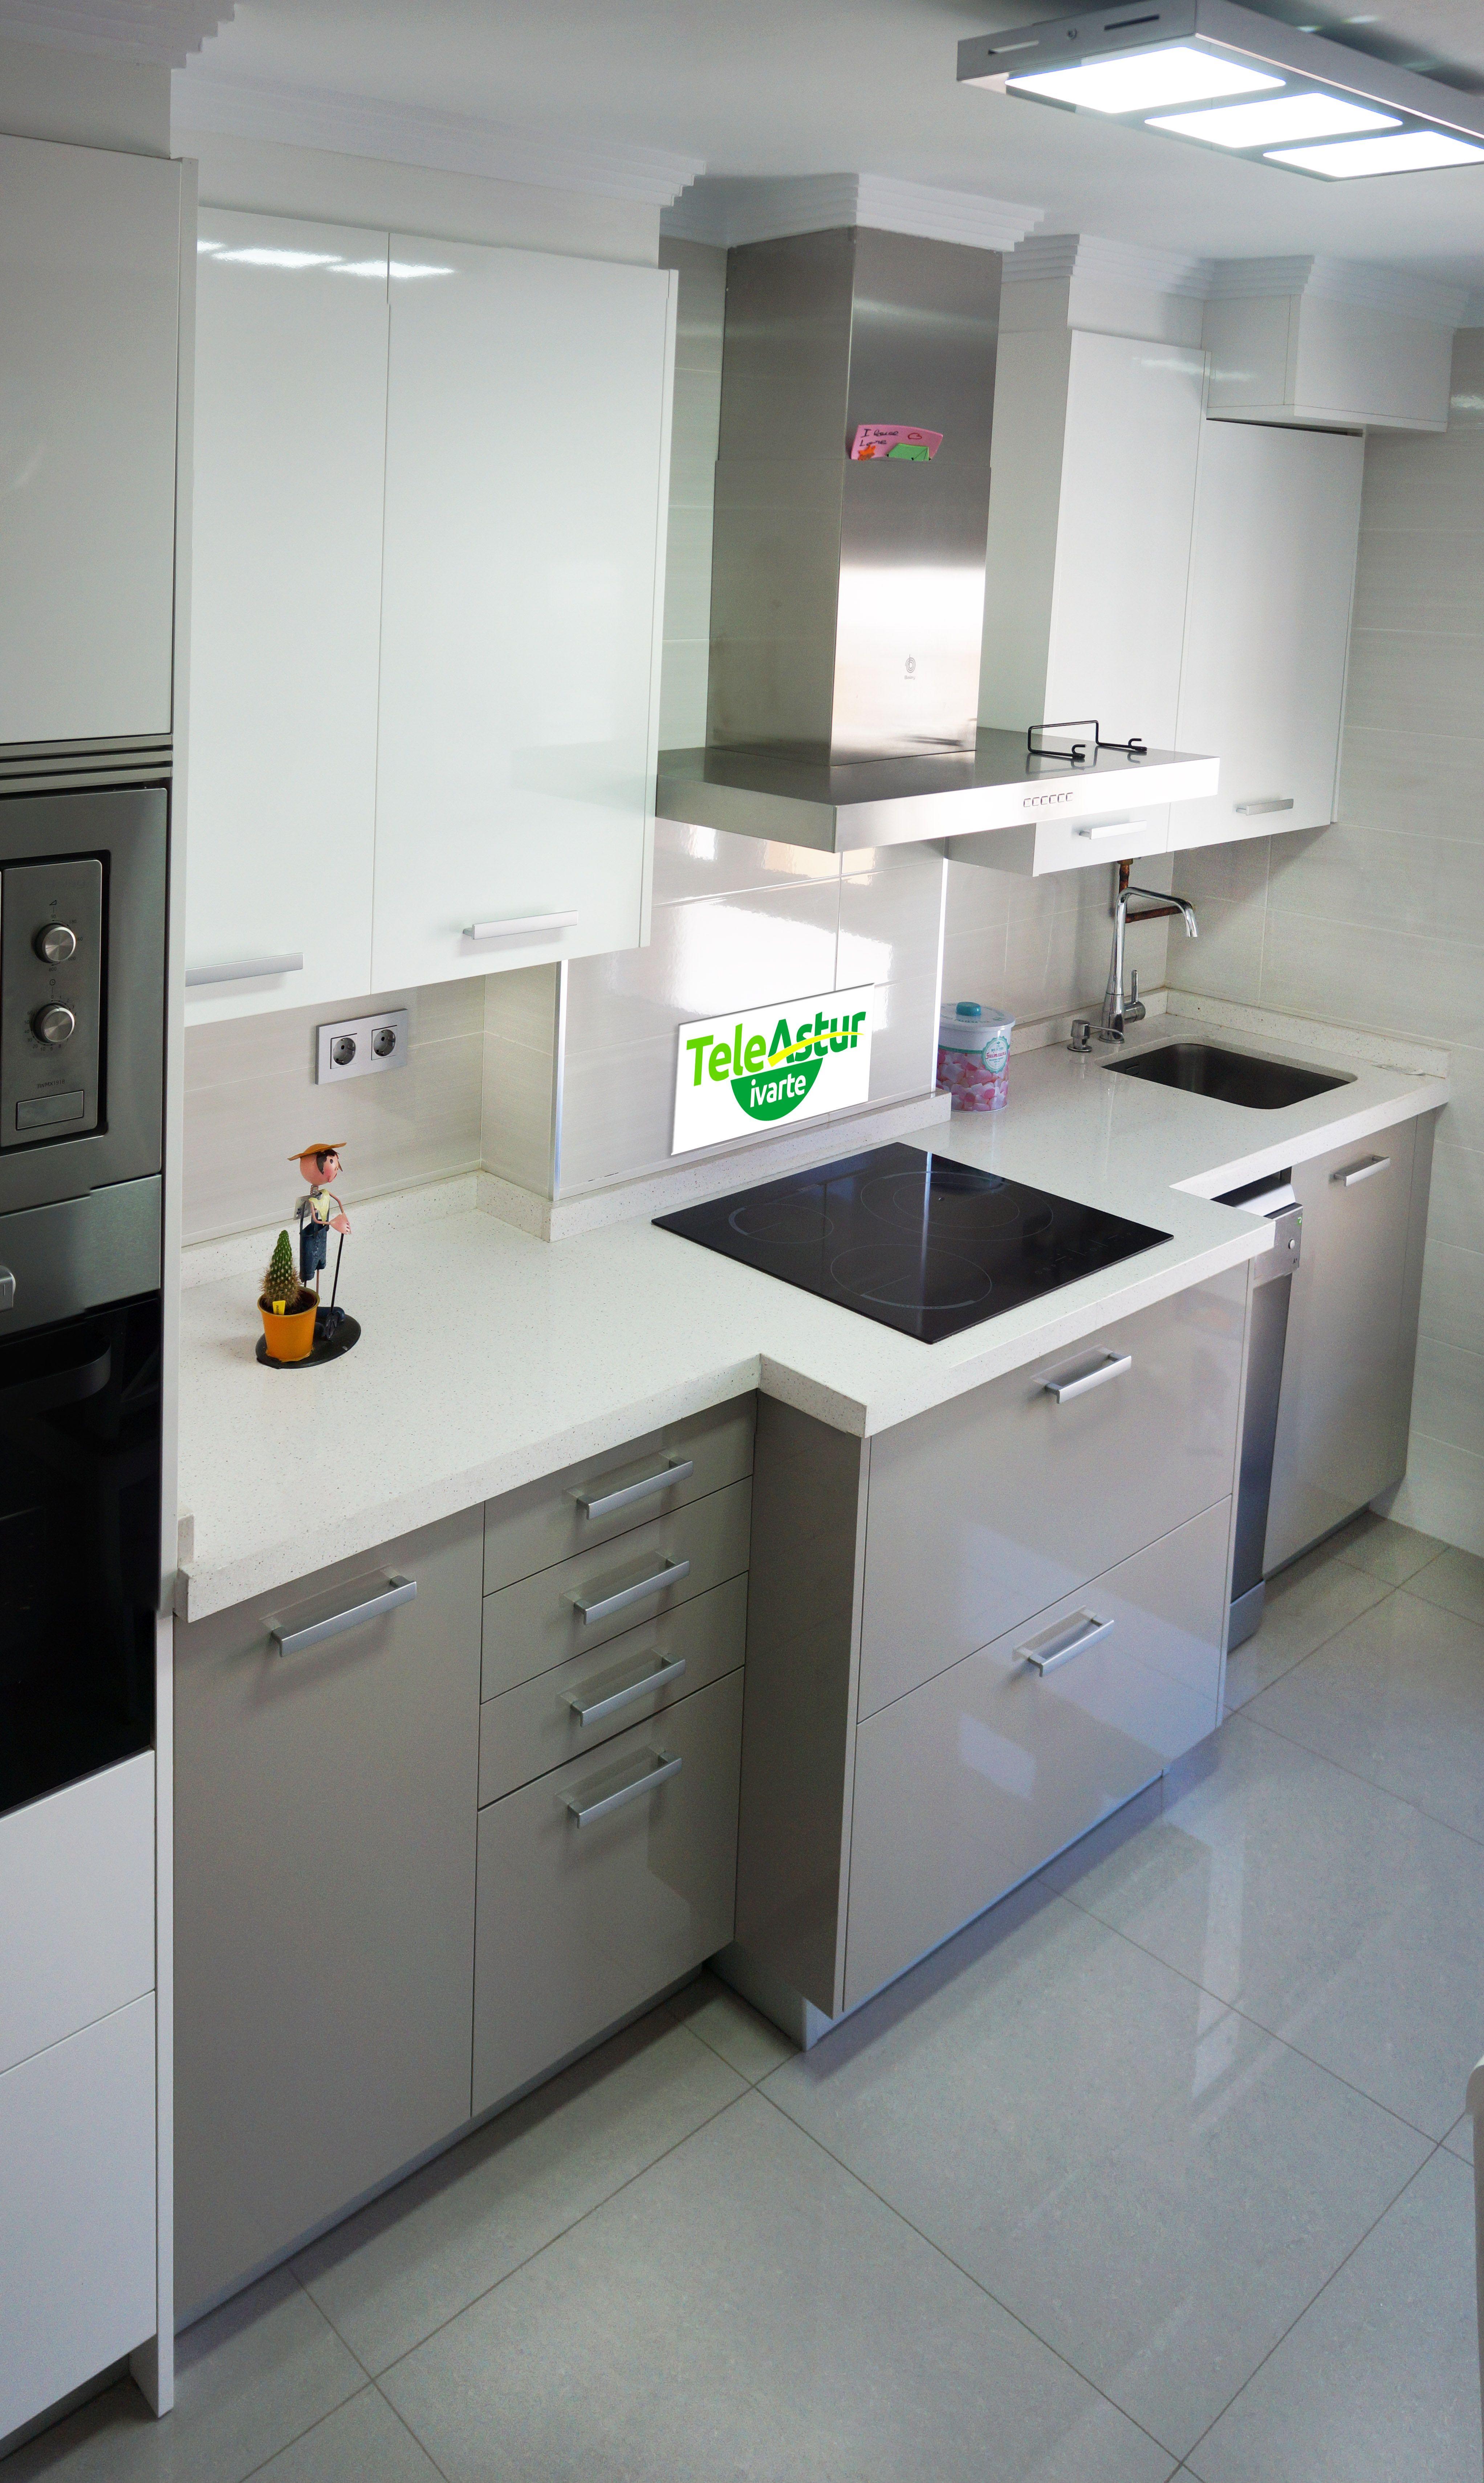 Silestone negro mate buscar con google escorial t for Encimera de cocina lacada en blanco negro